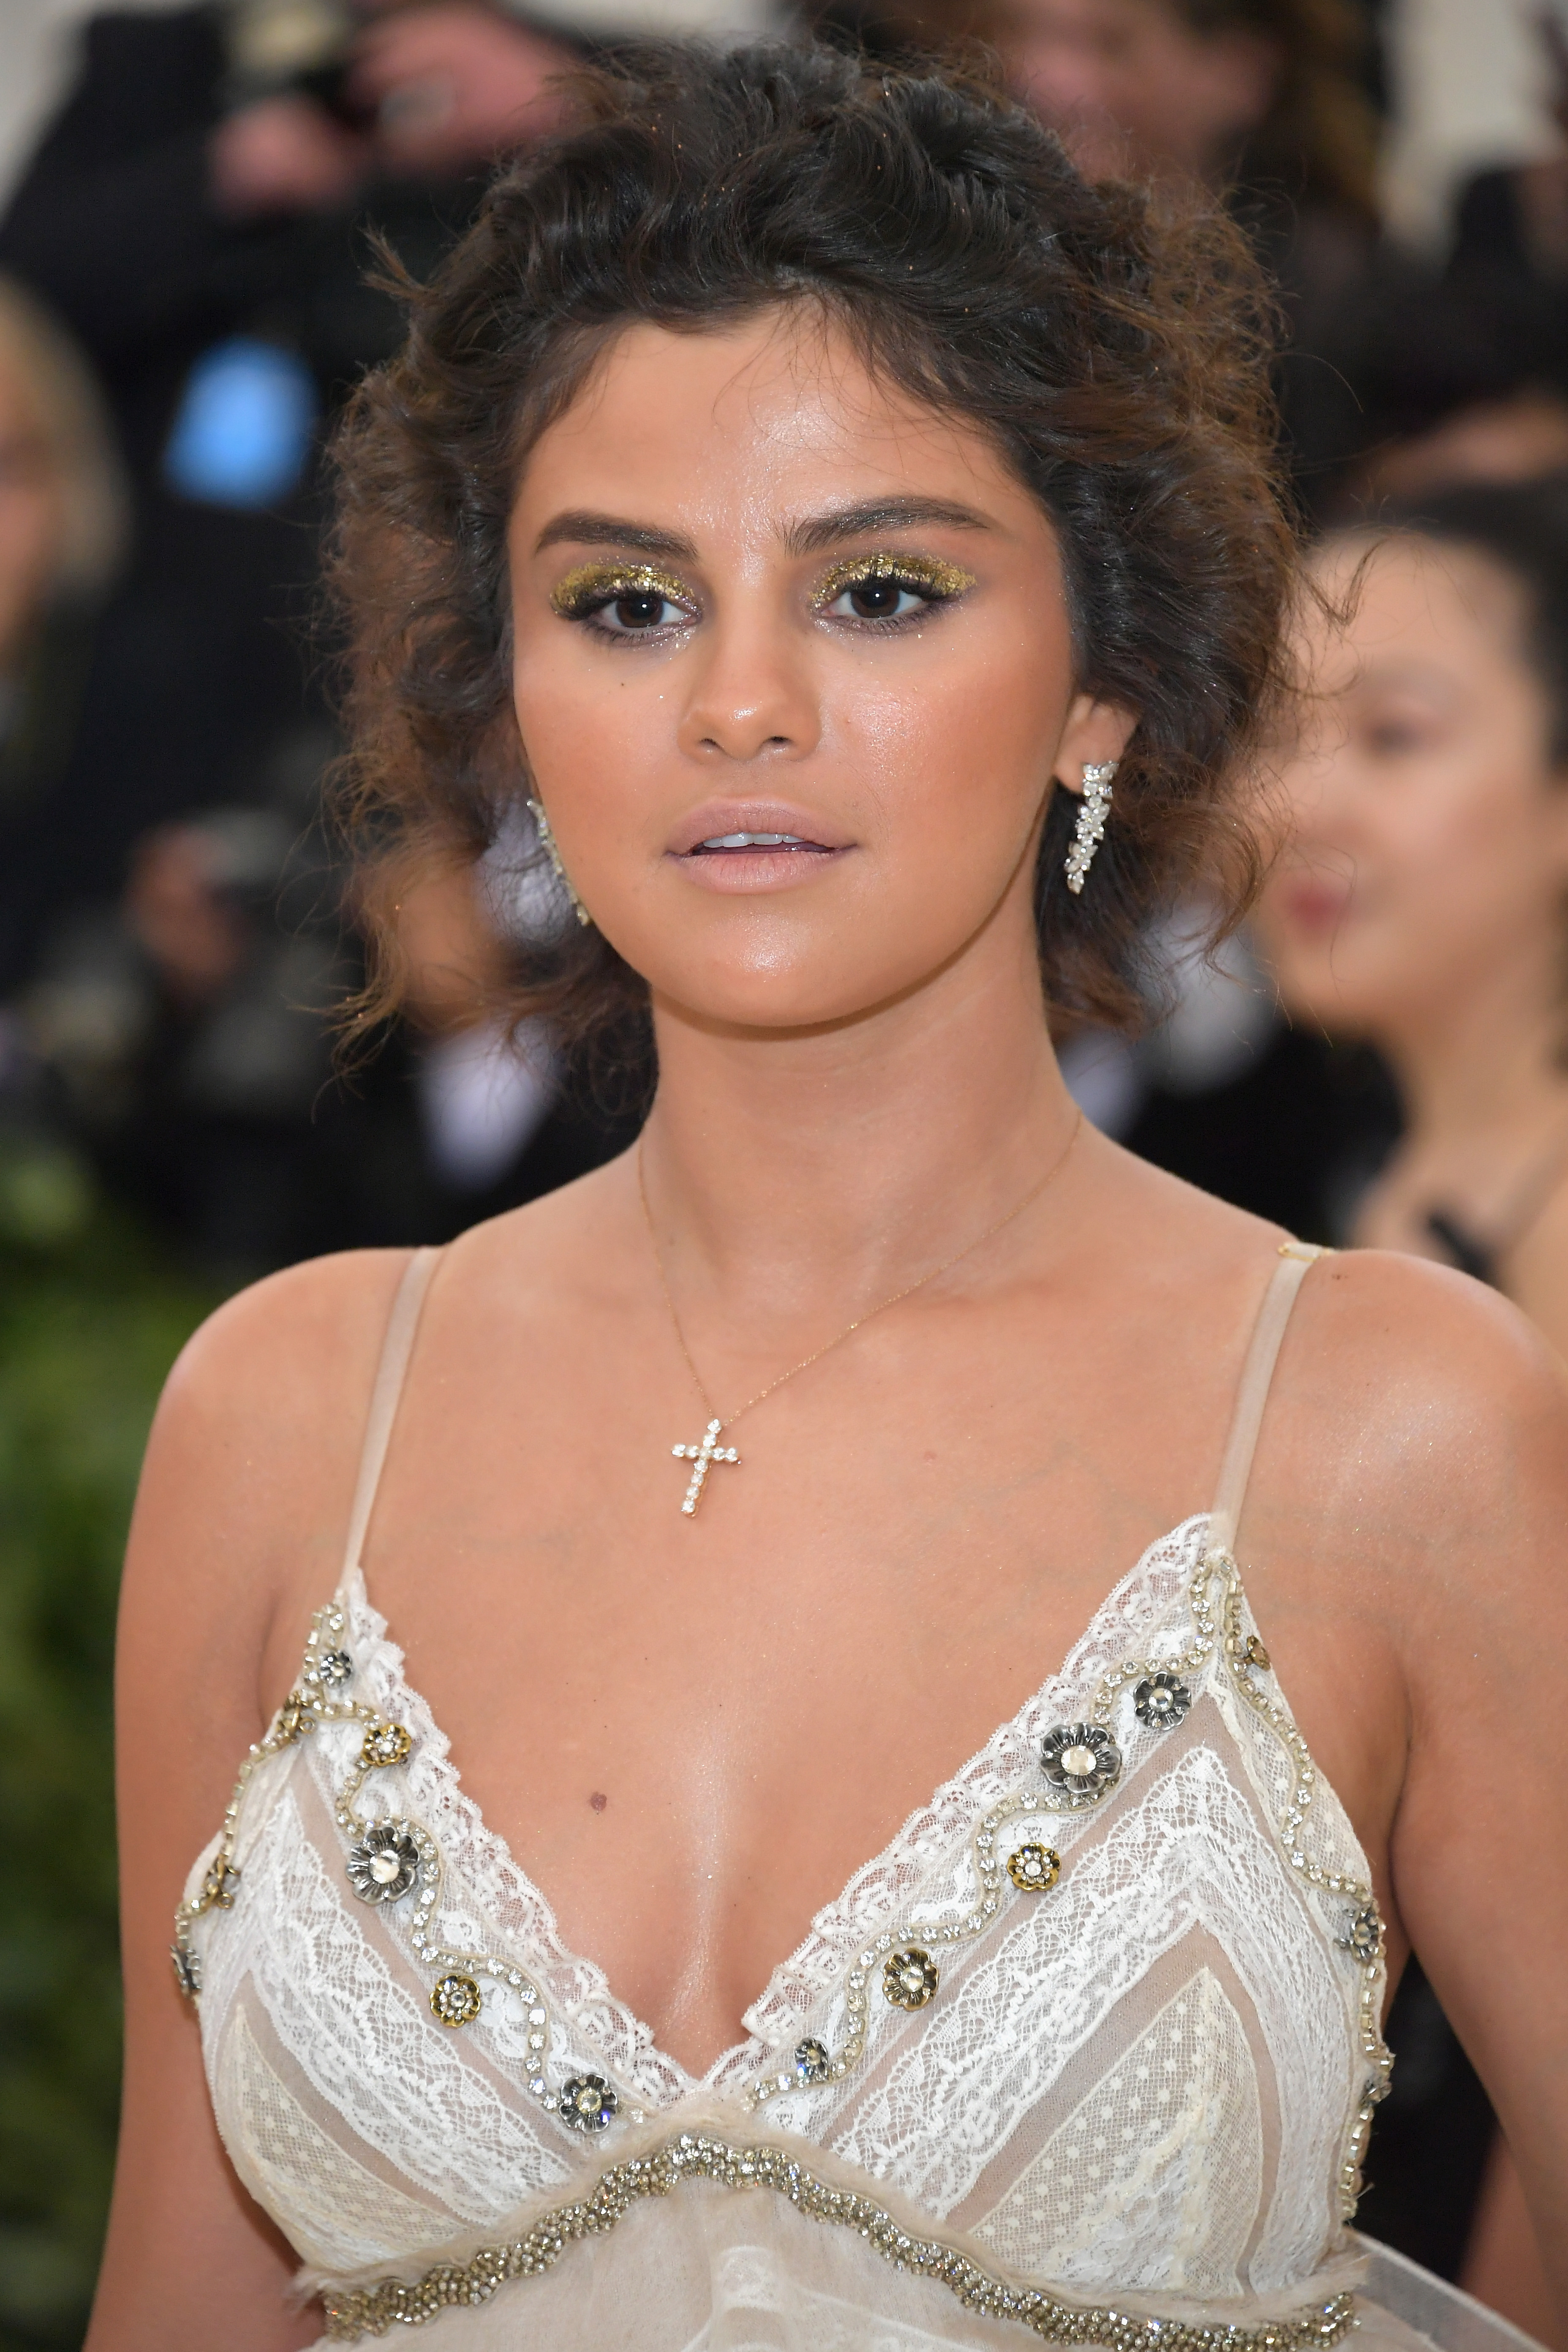 Selena-Gomez-Reacts-To-Her-Overly-Bronzed-Met-Gala-Look